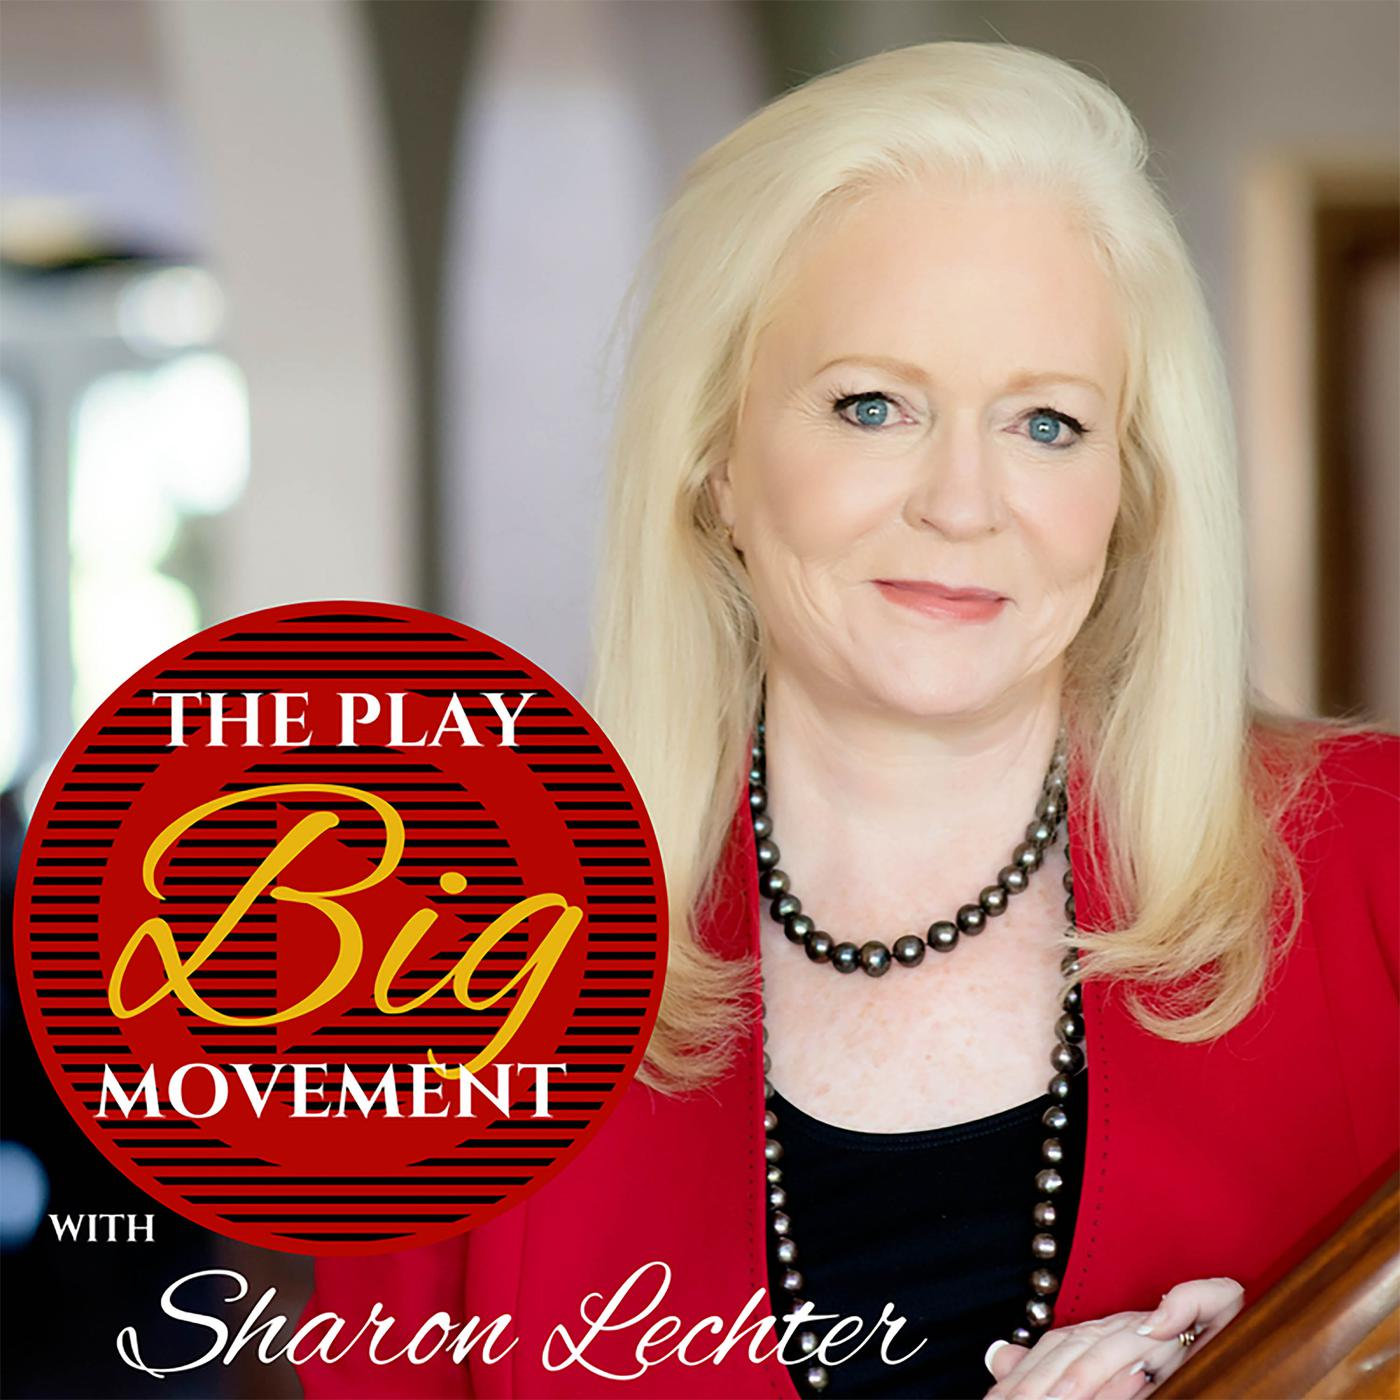 the-play-big-movement-sharon-lechter-7vKqVNy_ilH-x6nRLFXMJfv.1400x1400